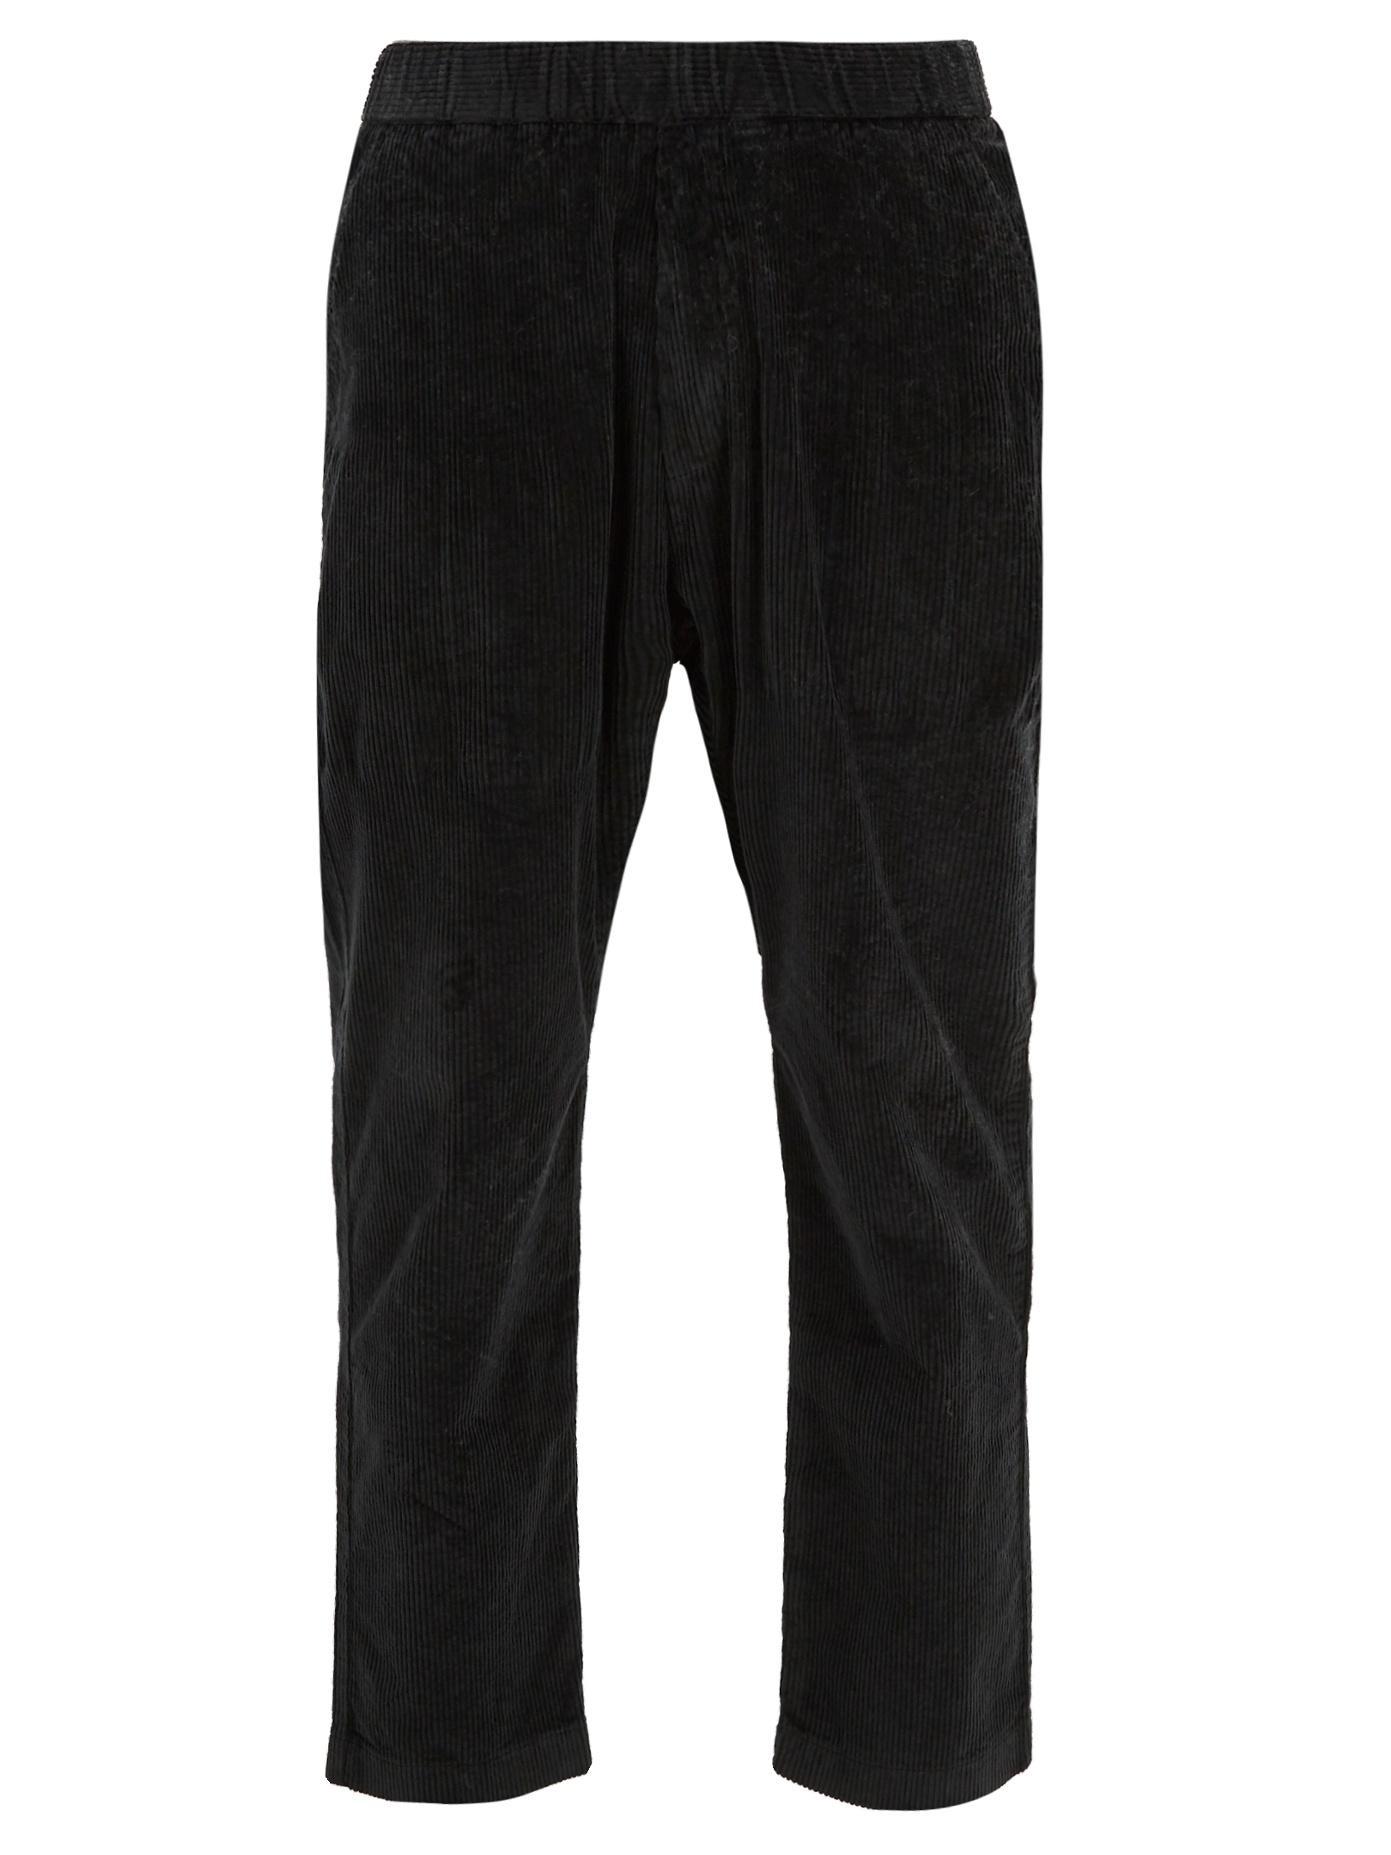 Barena Venezia Elasticated-Waist Cropped Stretch-Cotton Trousers In Black